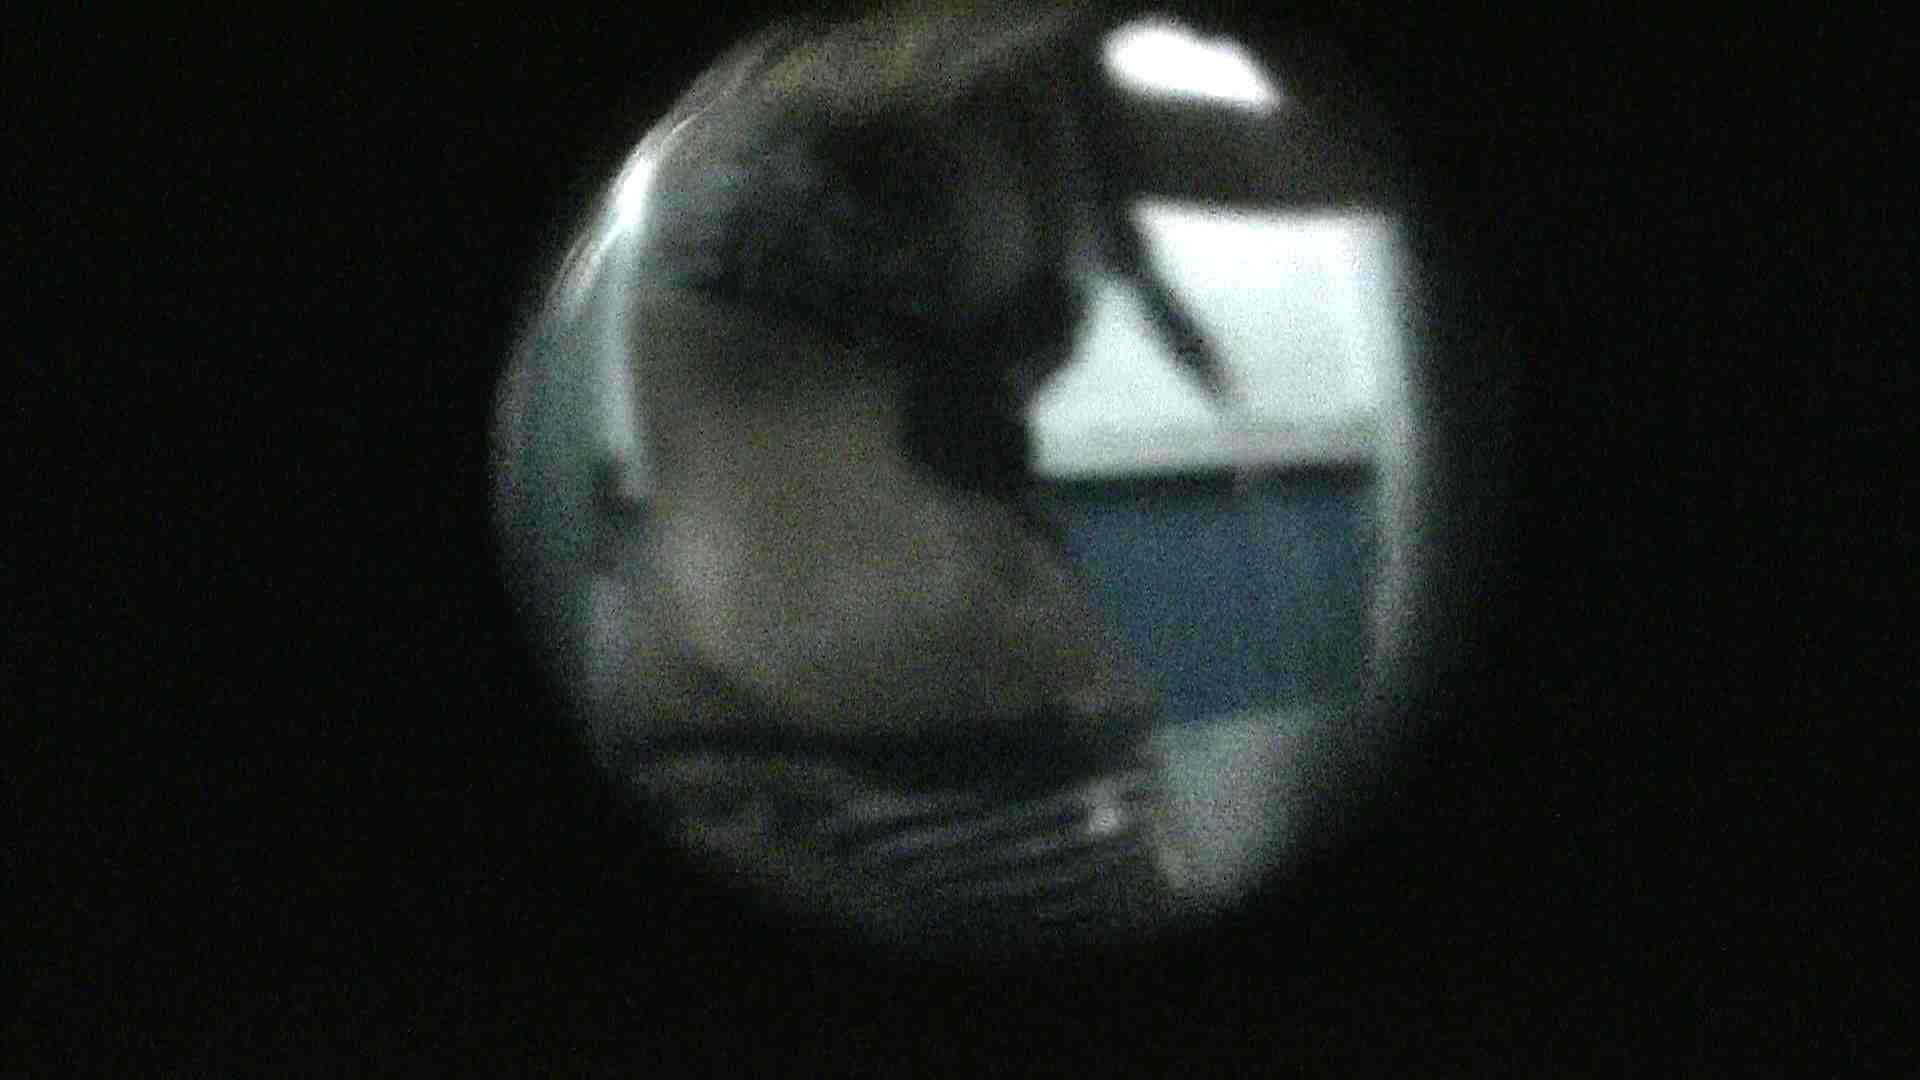 NO.13 暗いですが豪快な砂落としが好印象 覗き特集 われめAV動画紹介 88PIX 23